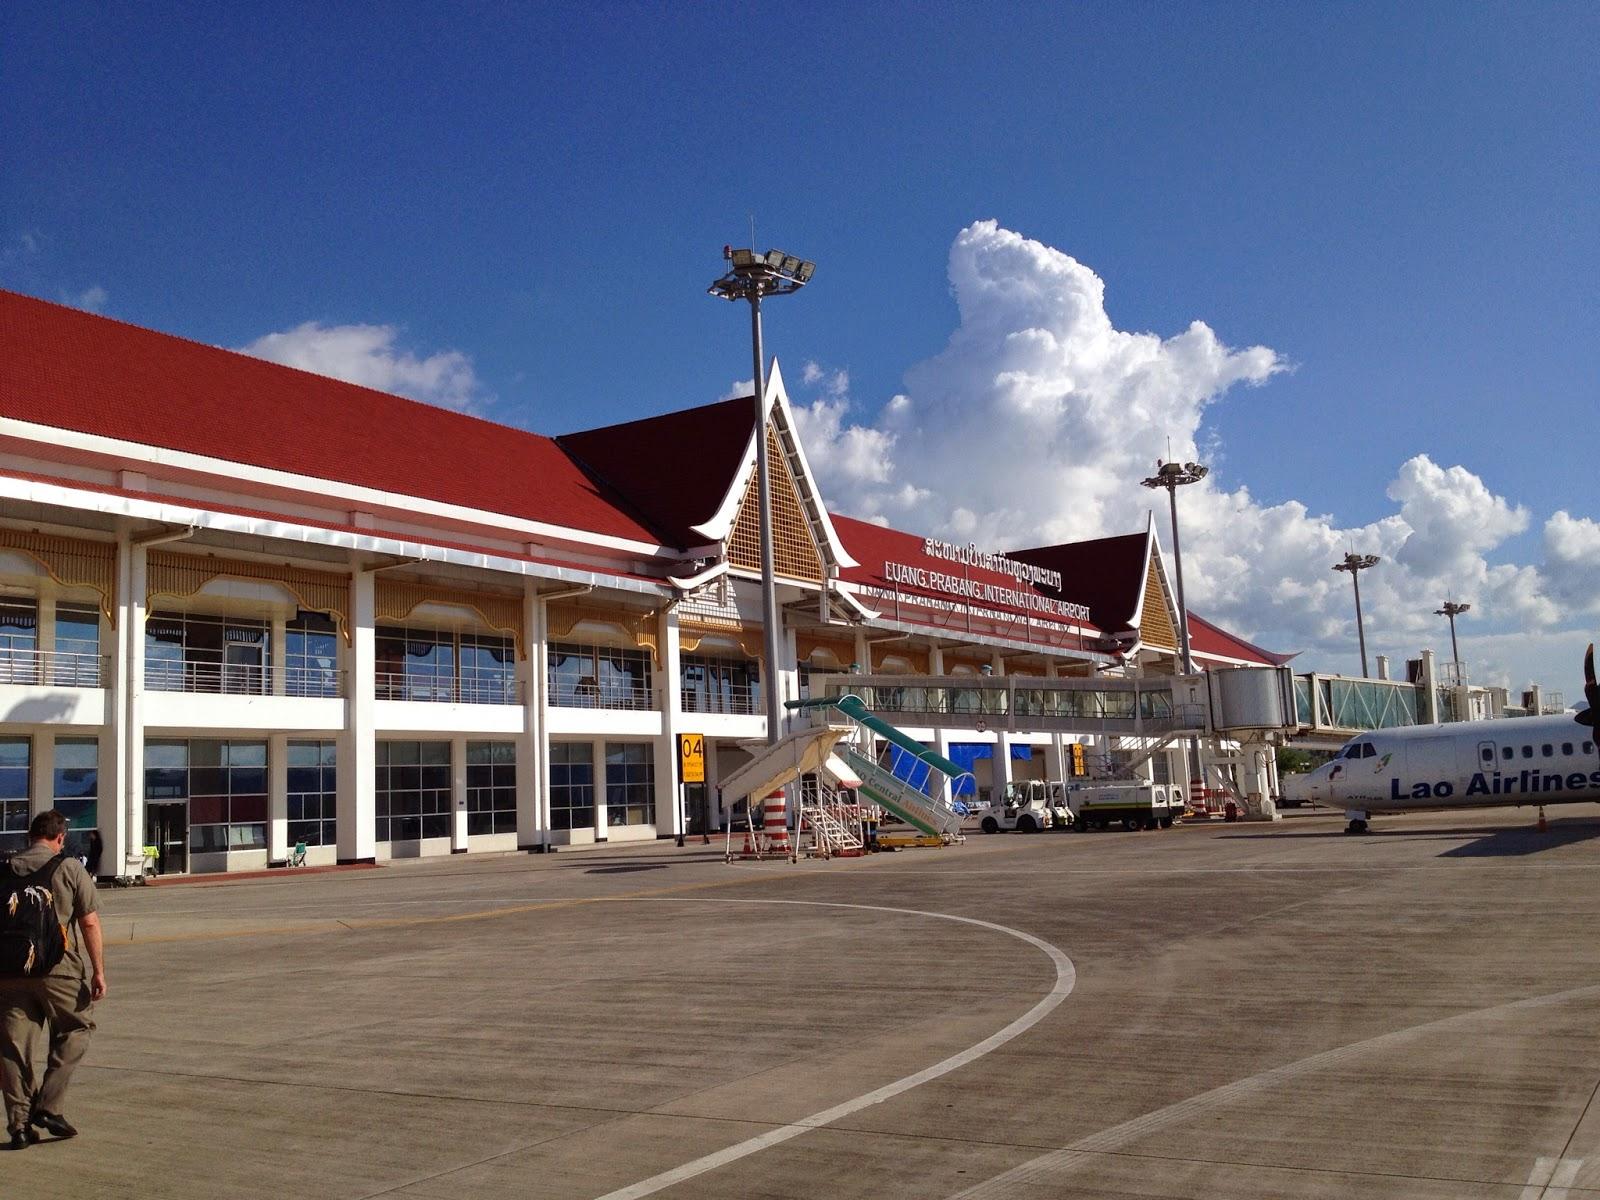 Luang Prabang - Airport